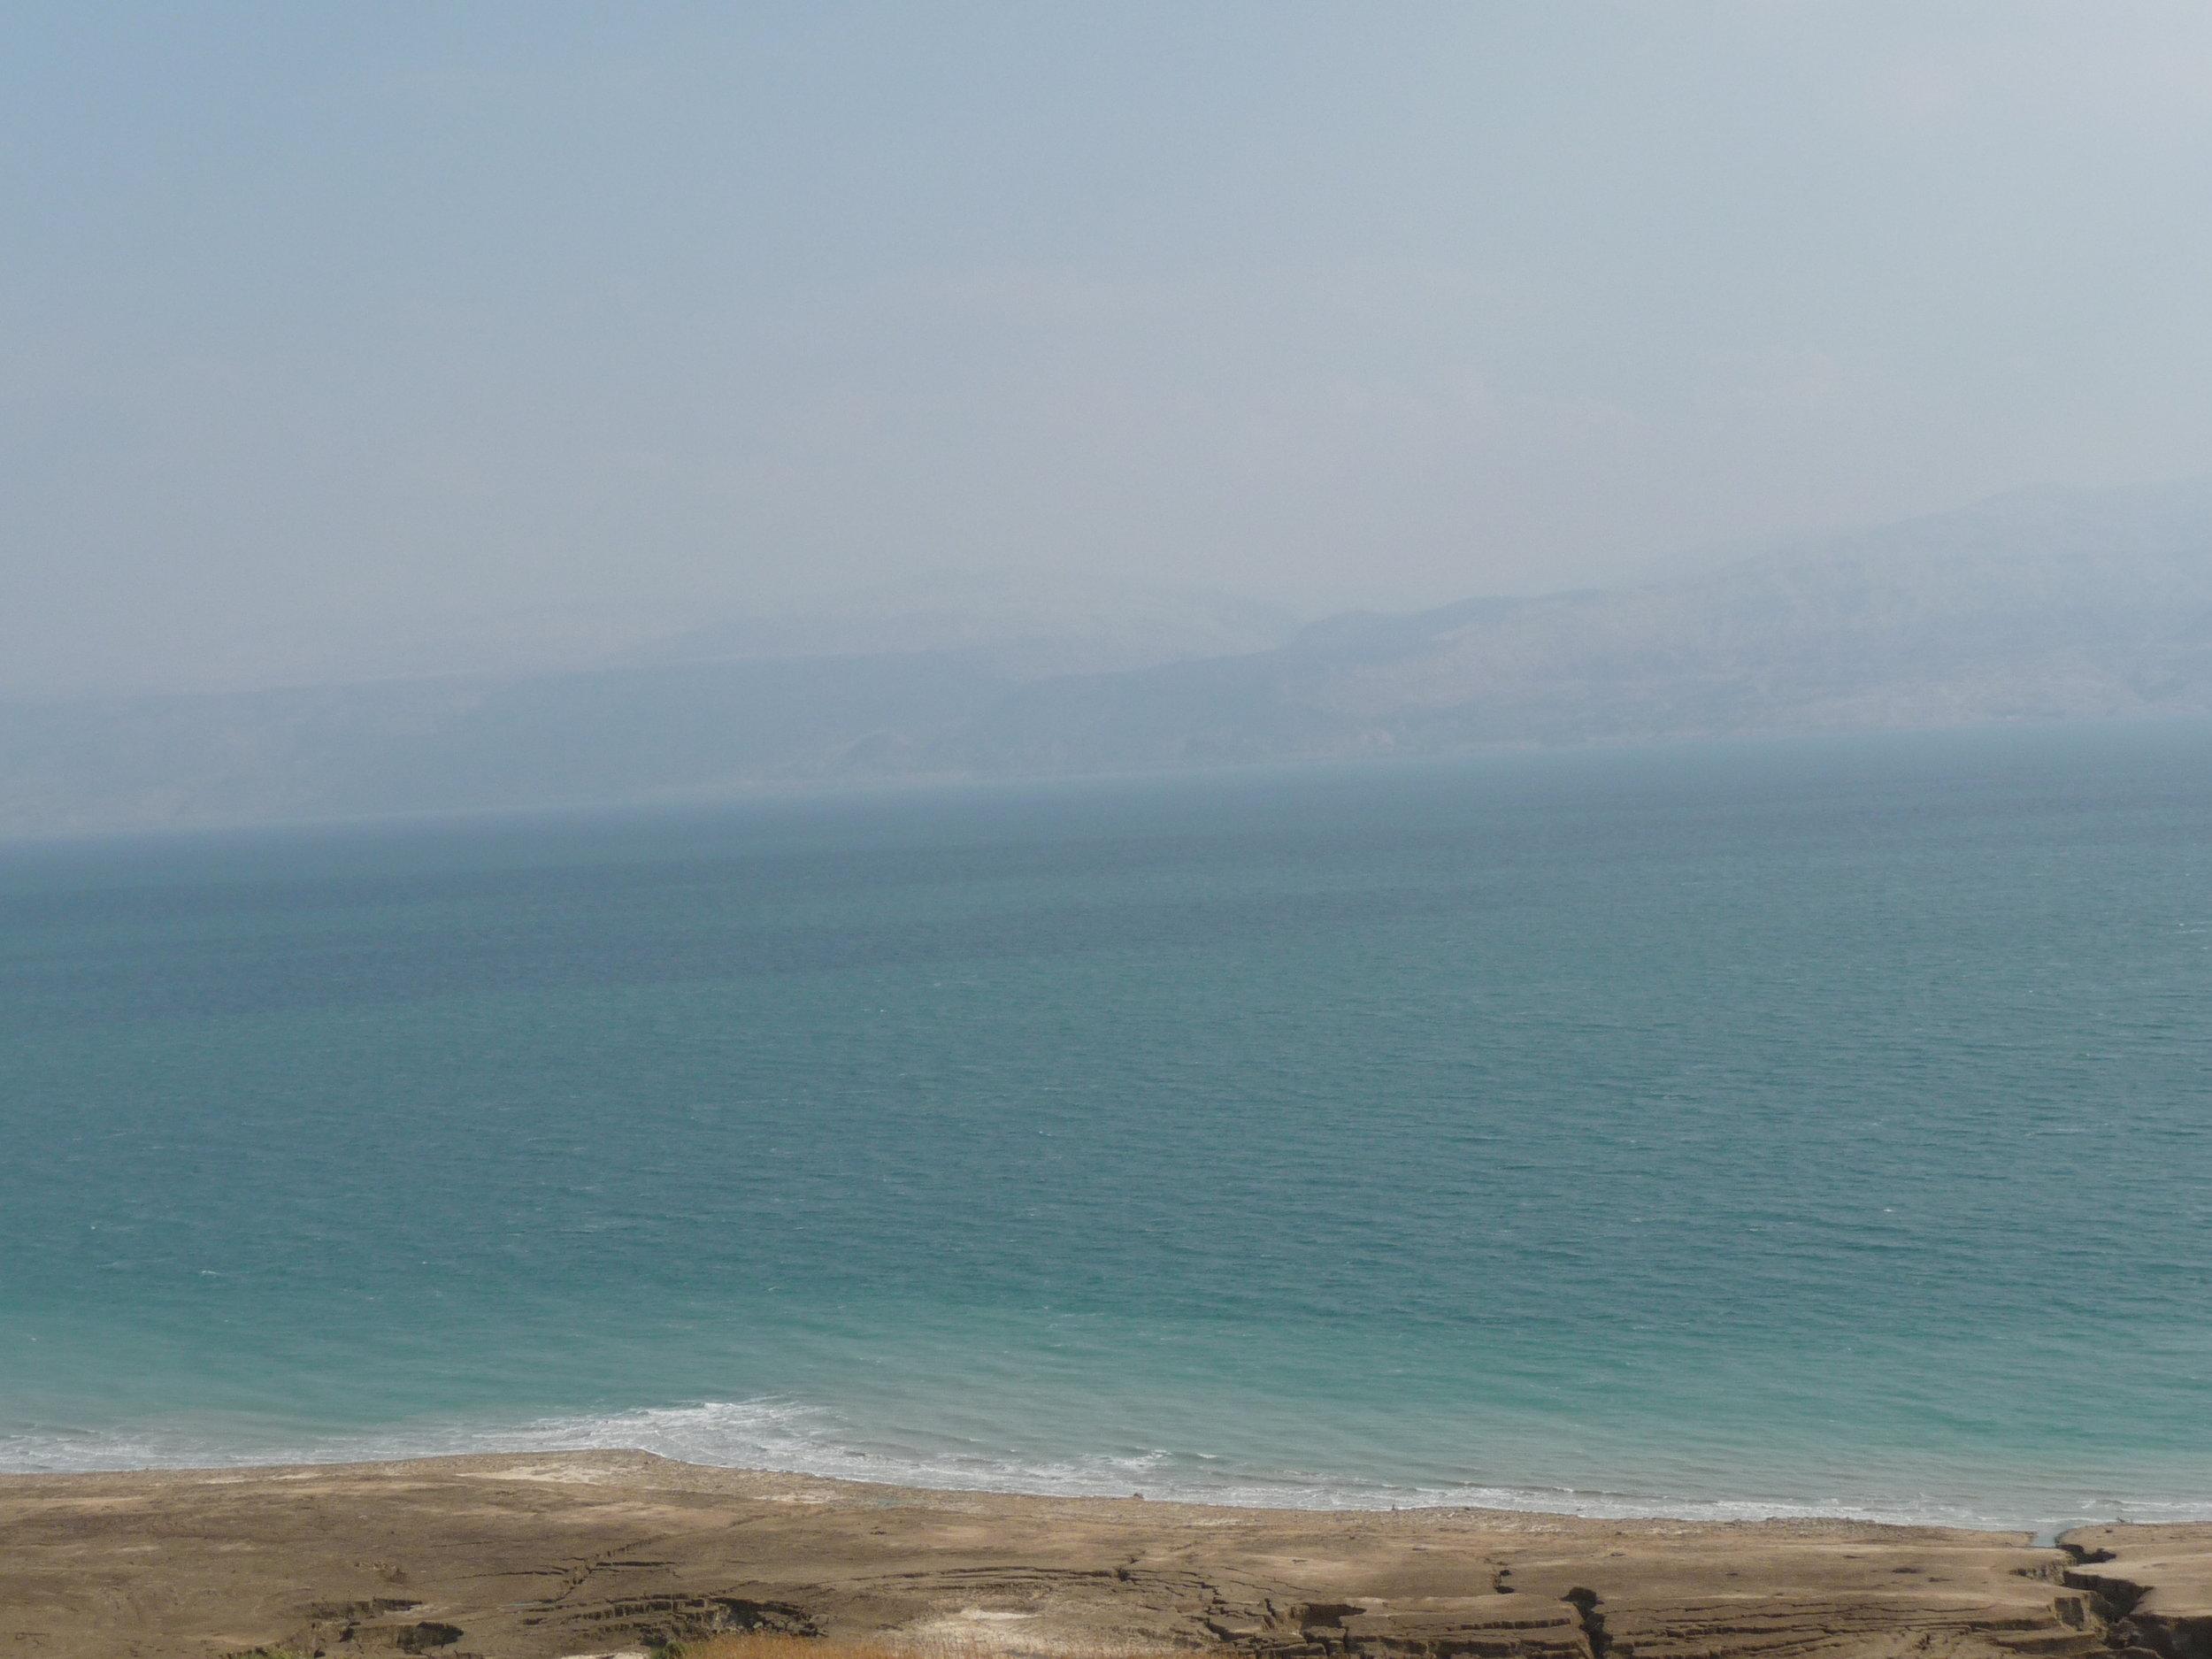 Dead sea looking towards Jordan 3.JPG